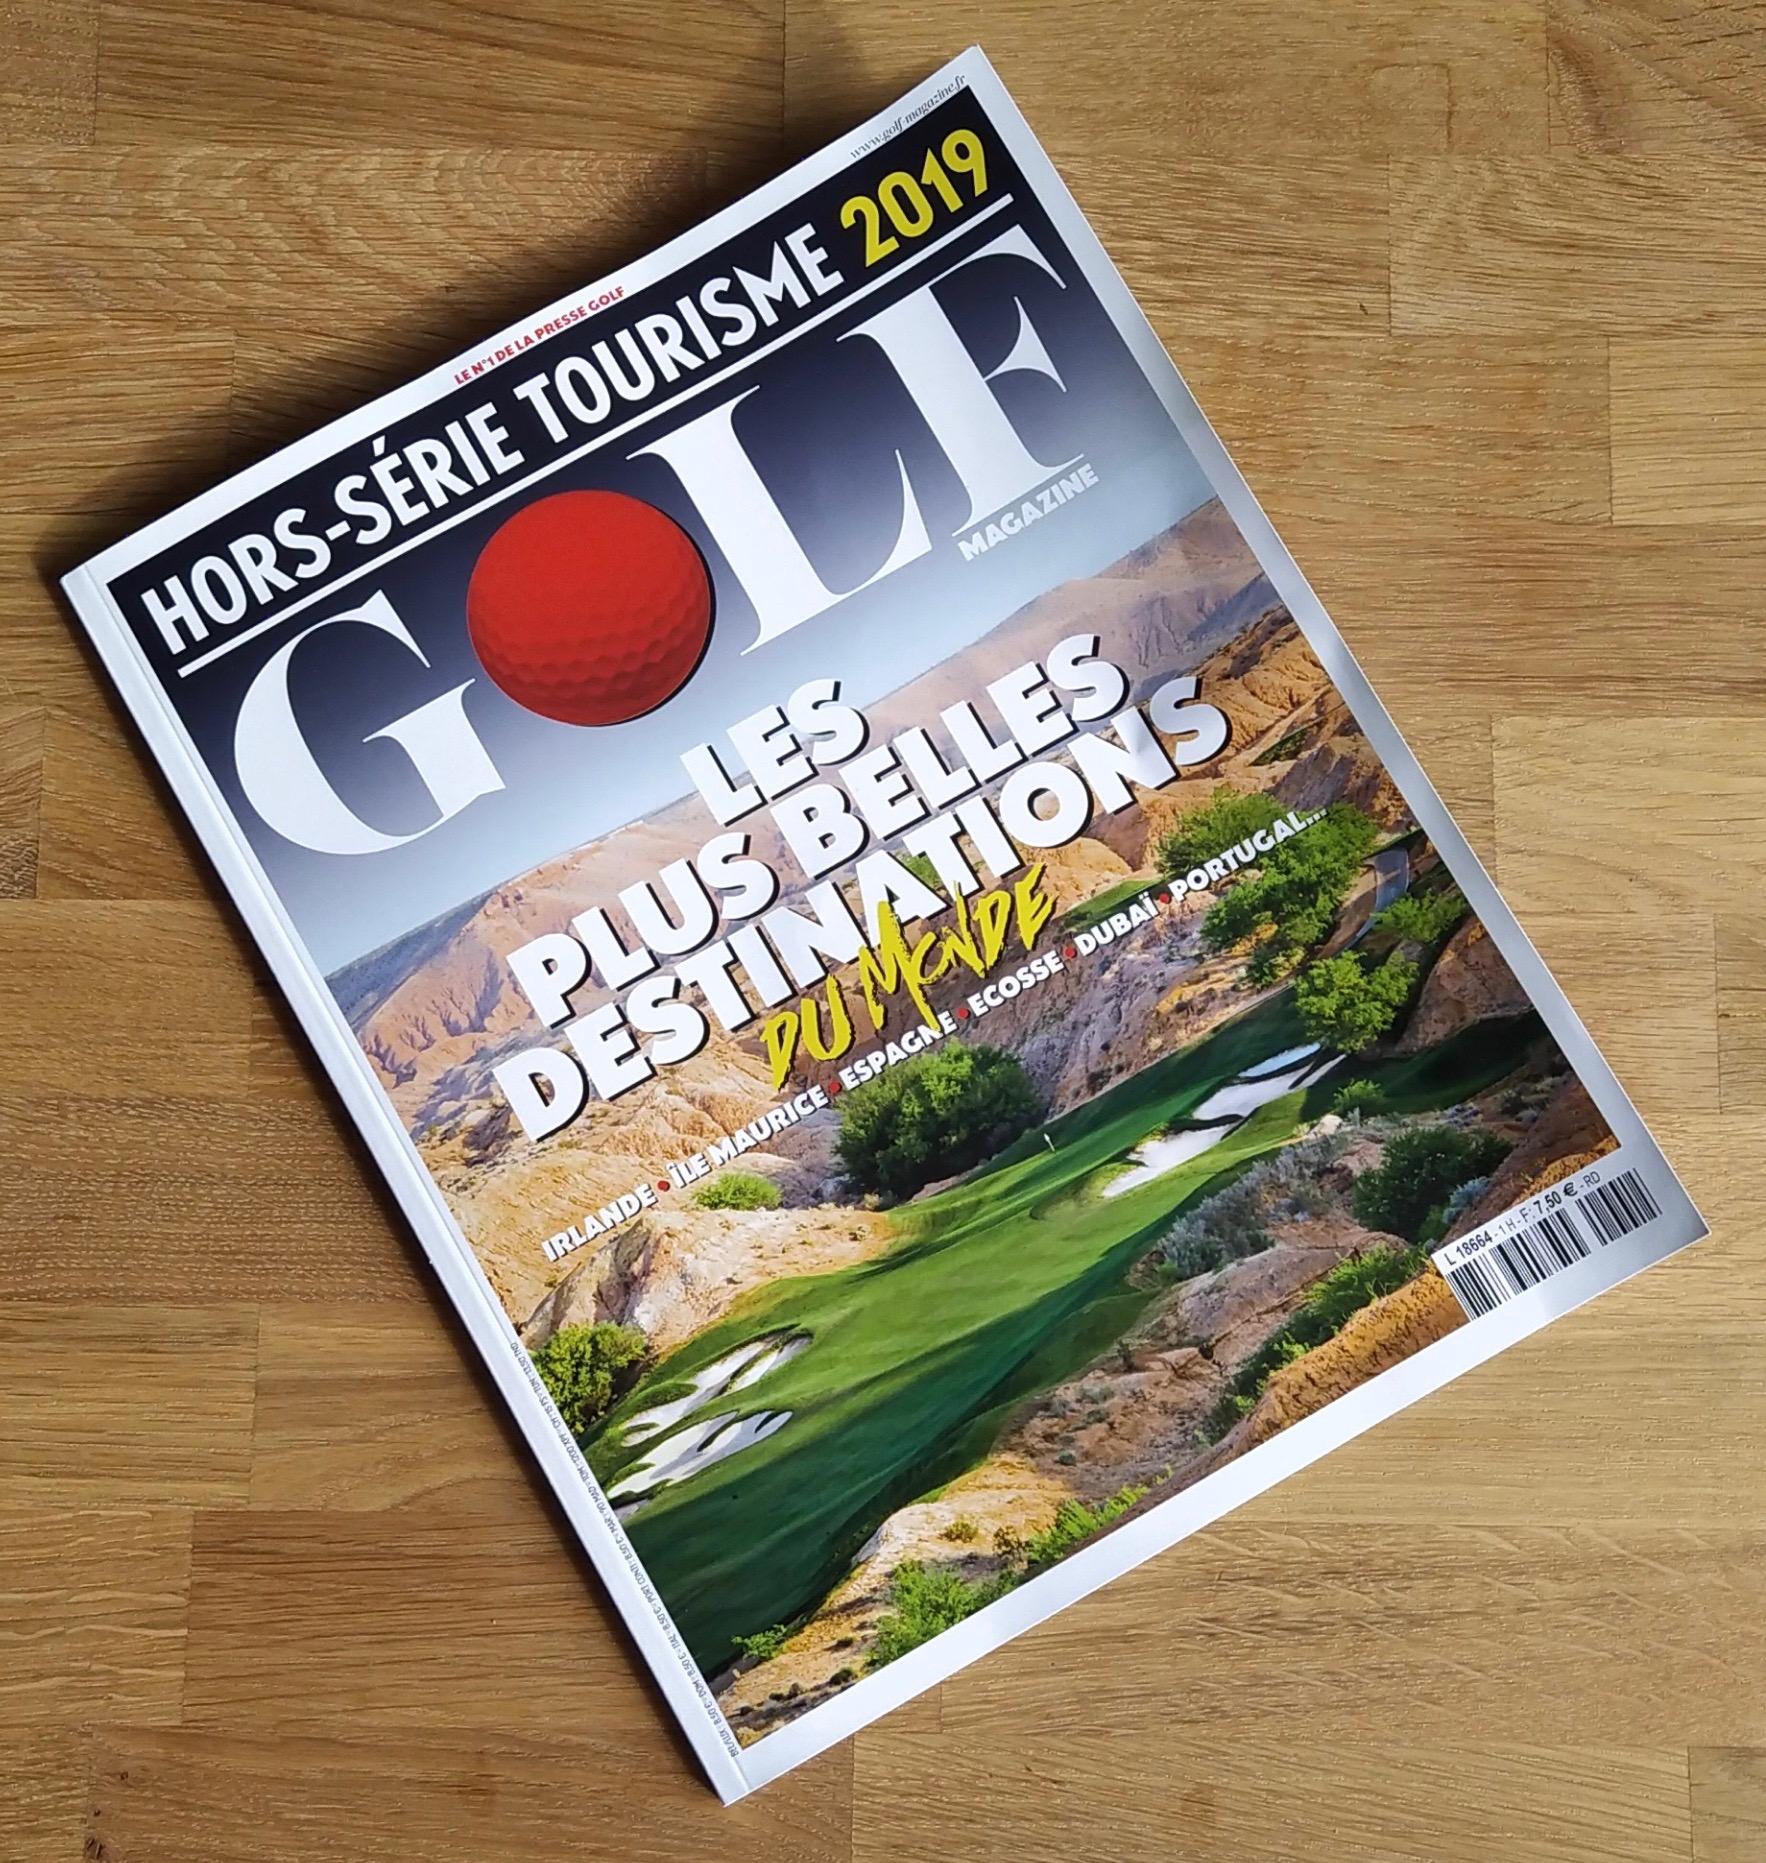 fandegolf.fr mon premier magazine